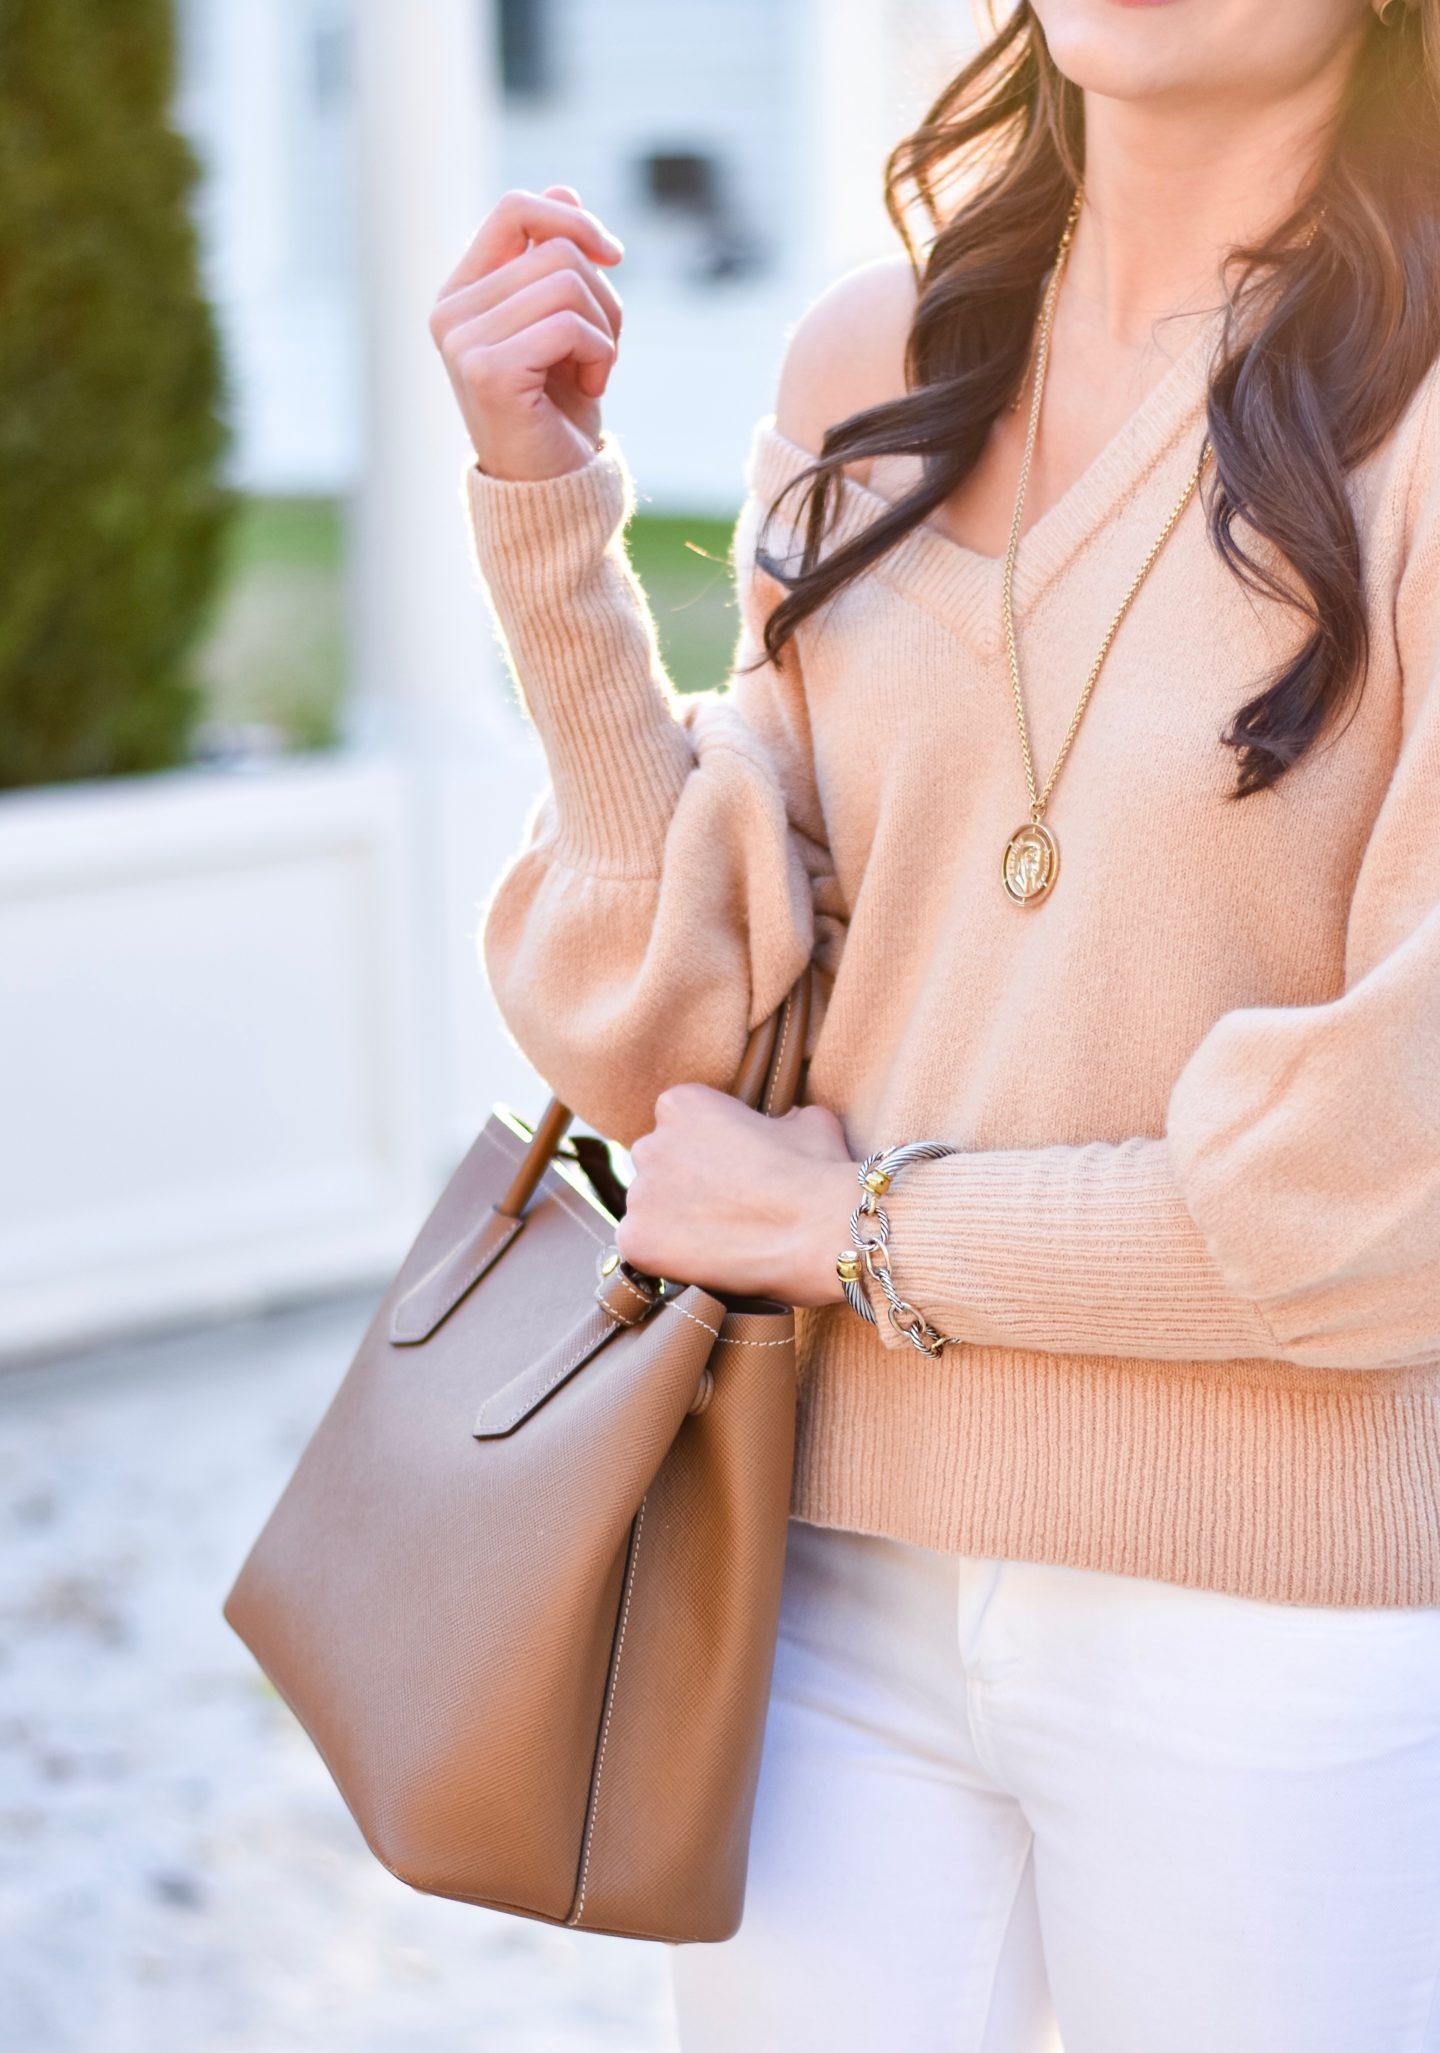 Terra Roisin Fifteen Minutes to Flawless Easy Winter Basics